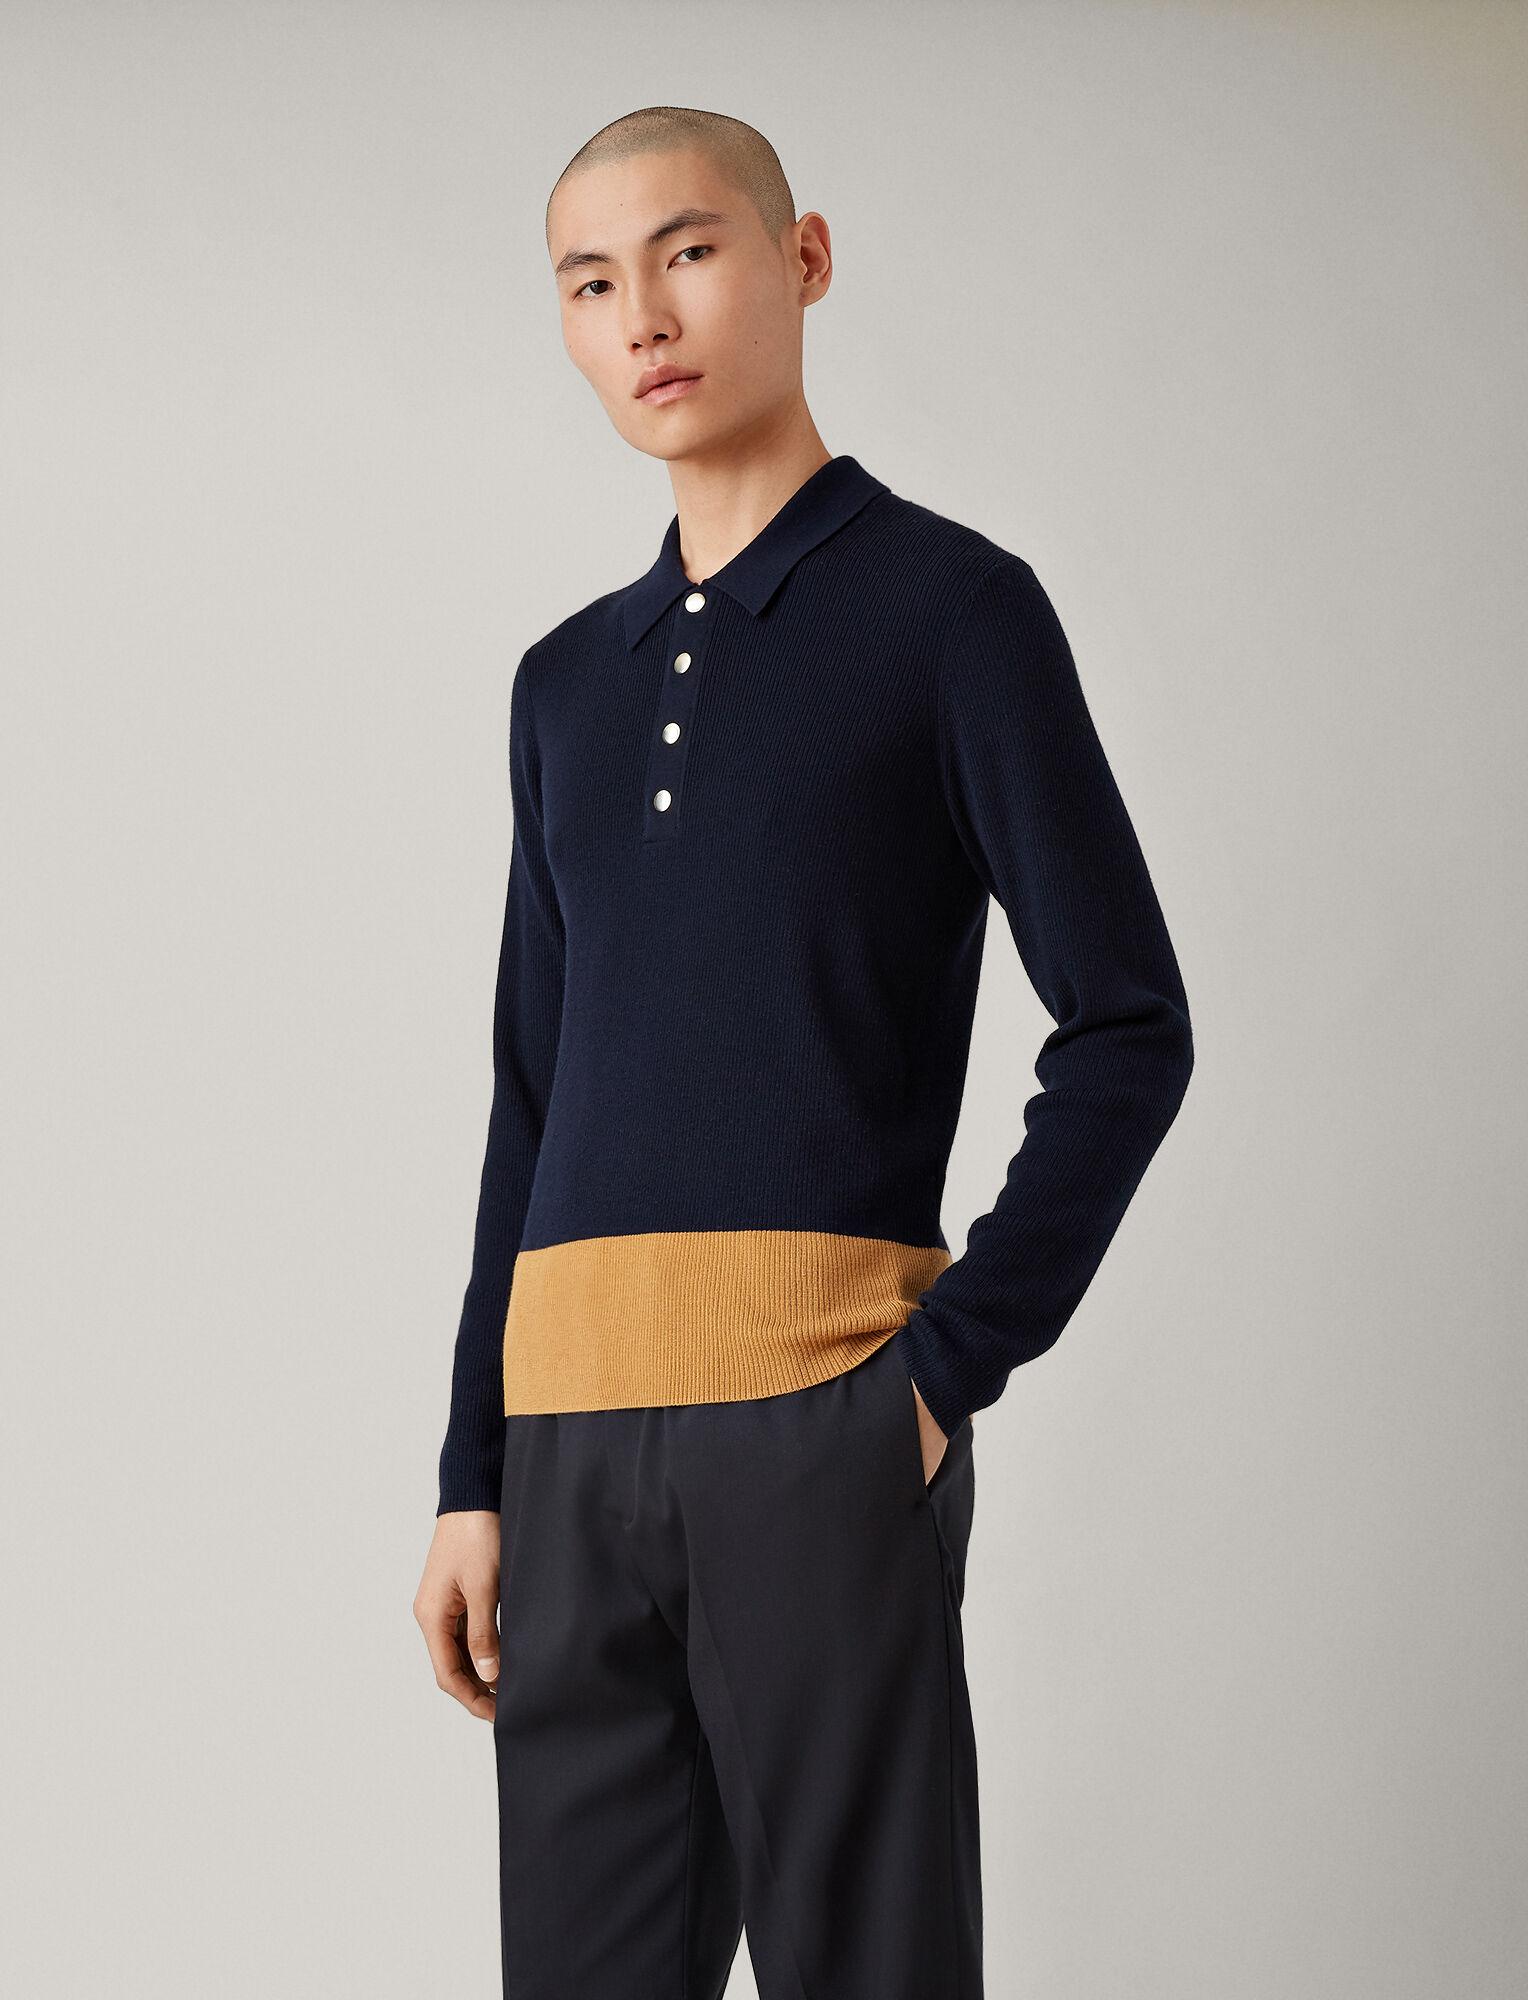 Joseph, Polo Neck Fine Rib + Snaps Knit, in NAVY